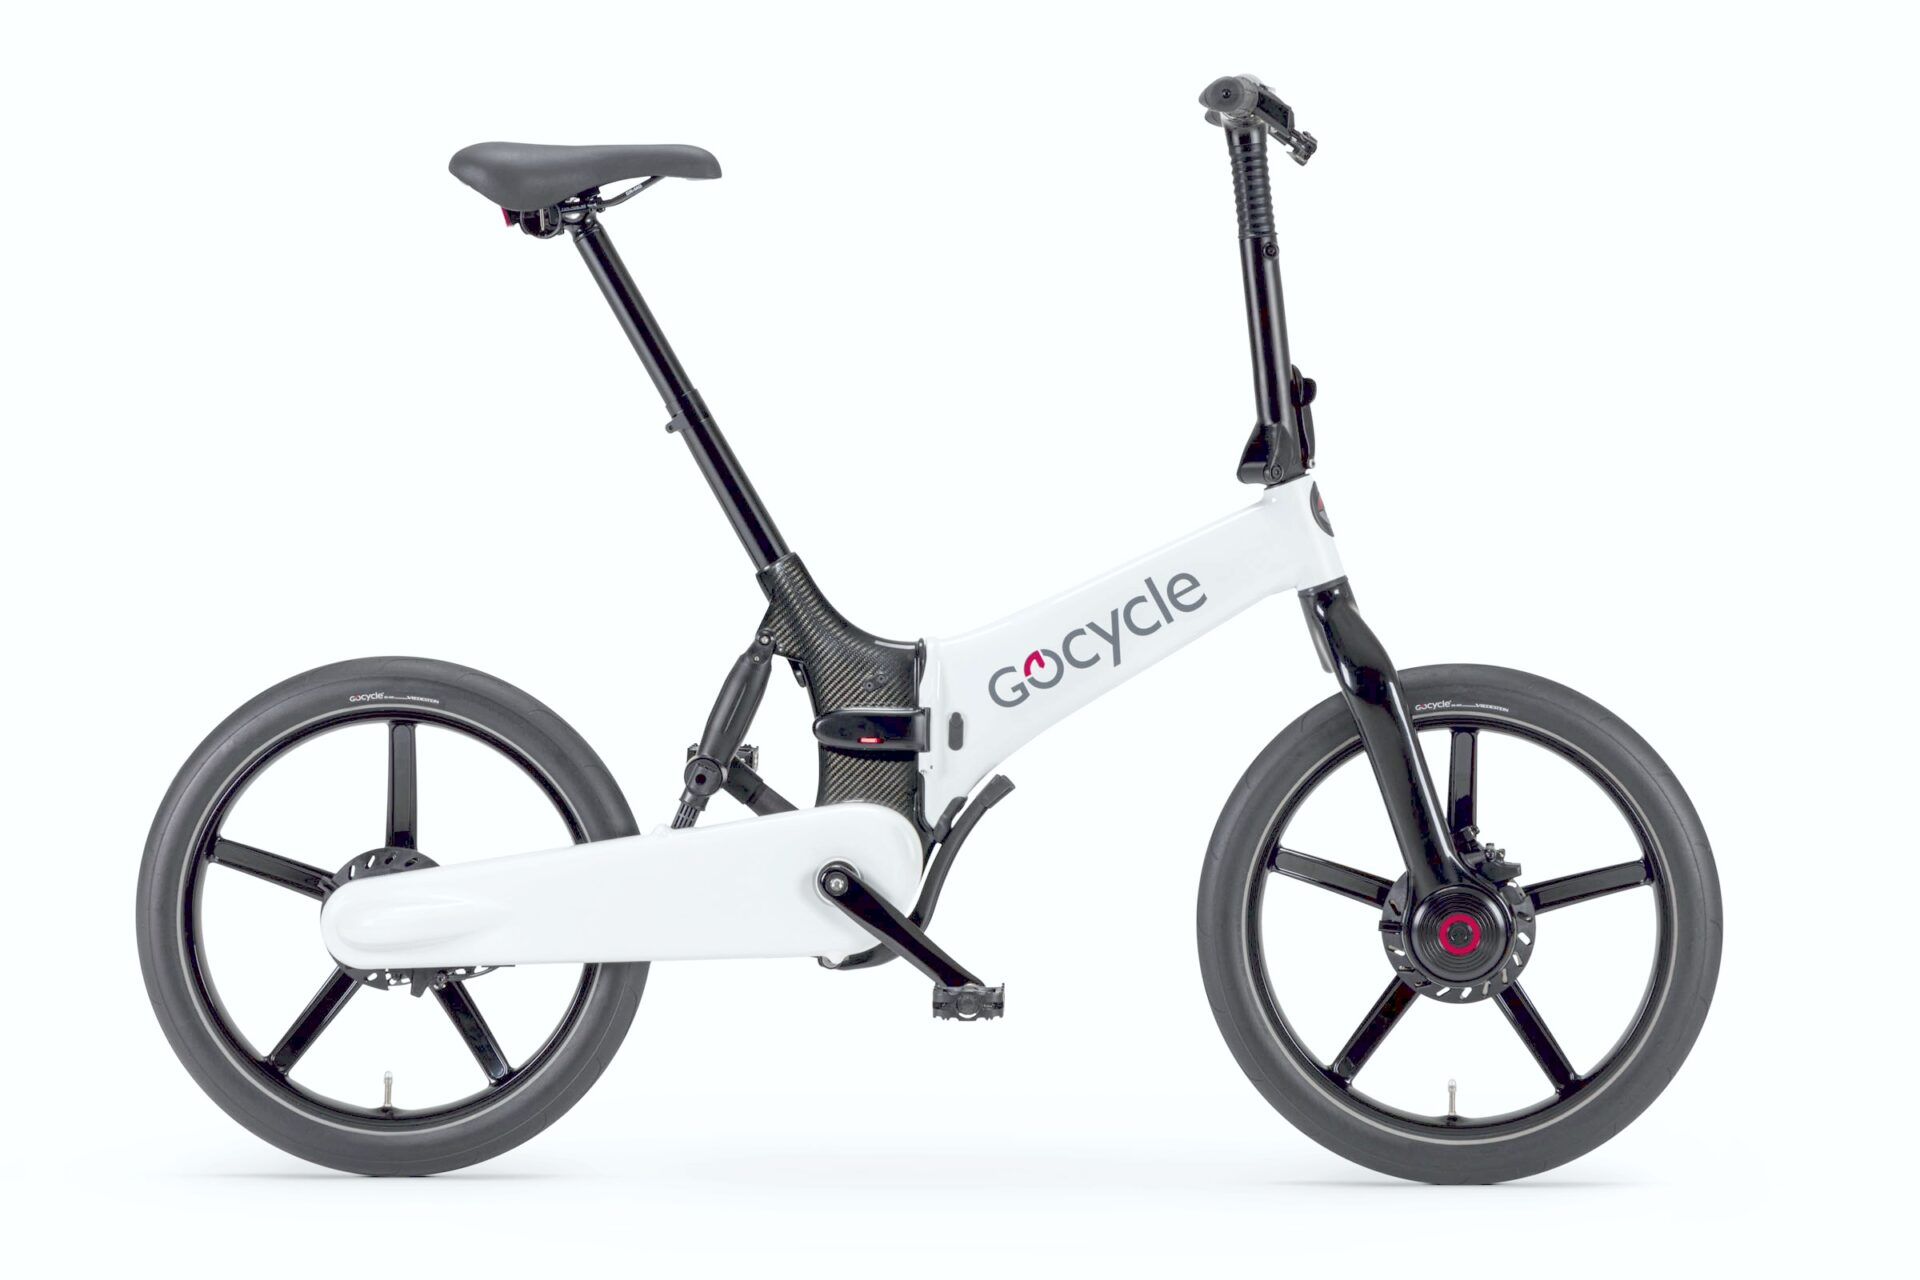 Gocycle G4 belo/črna barva